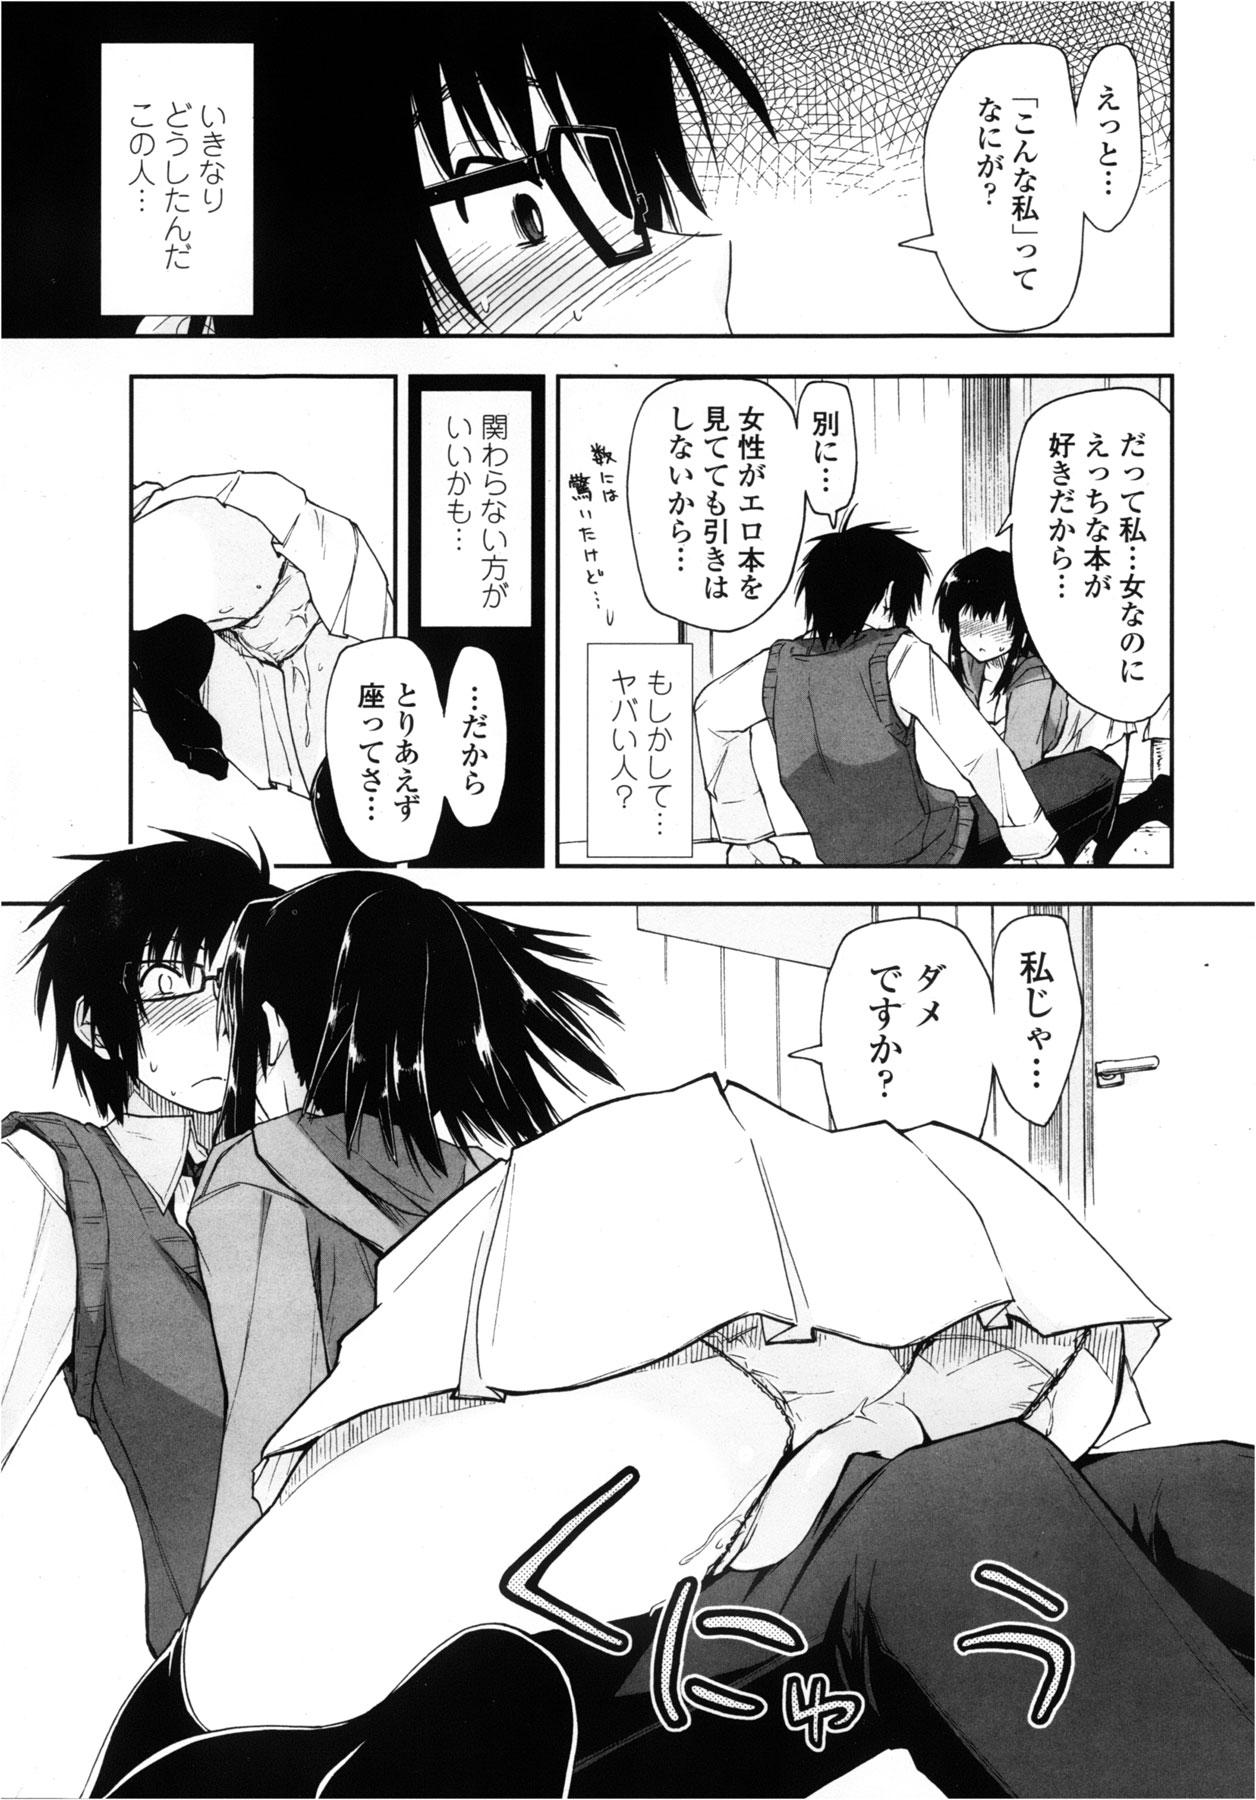 COMIC Penguin Club Sanzokuban 2013-02 16